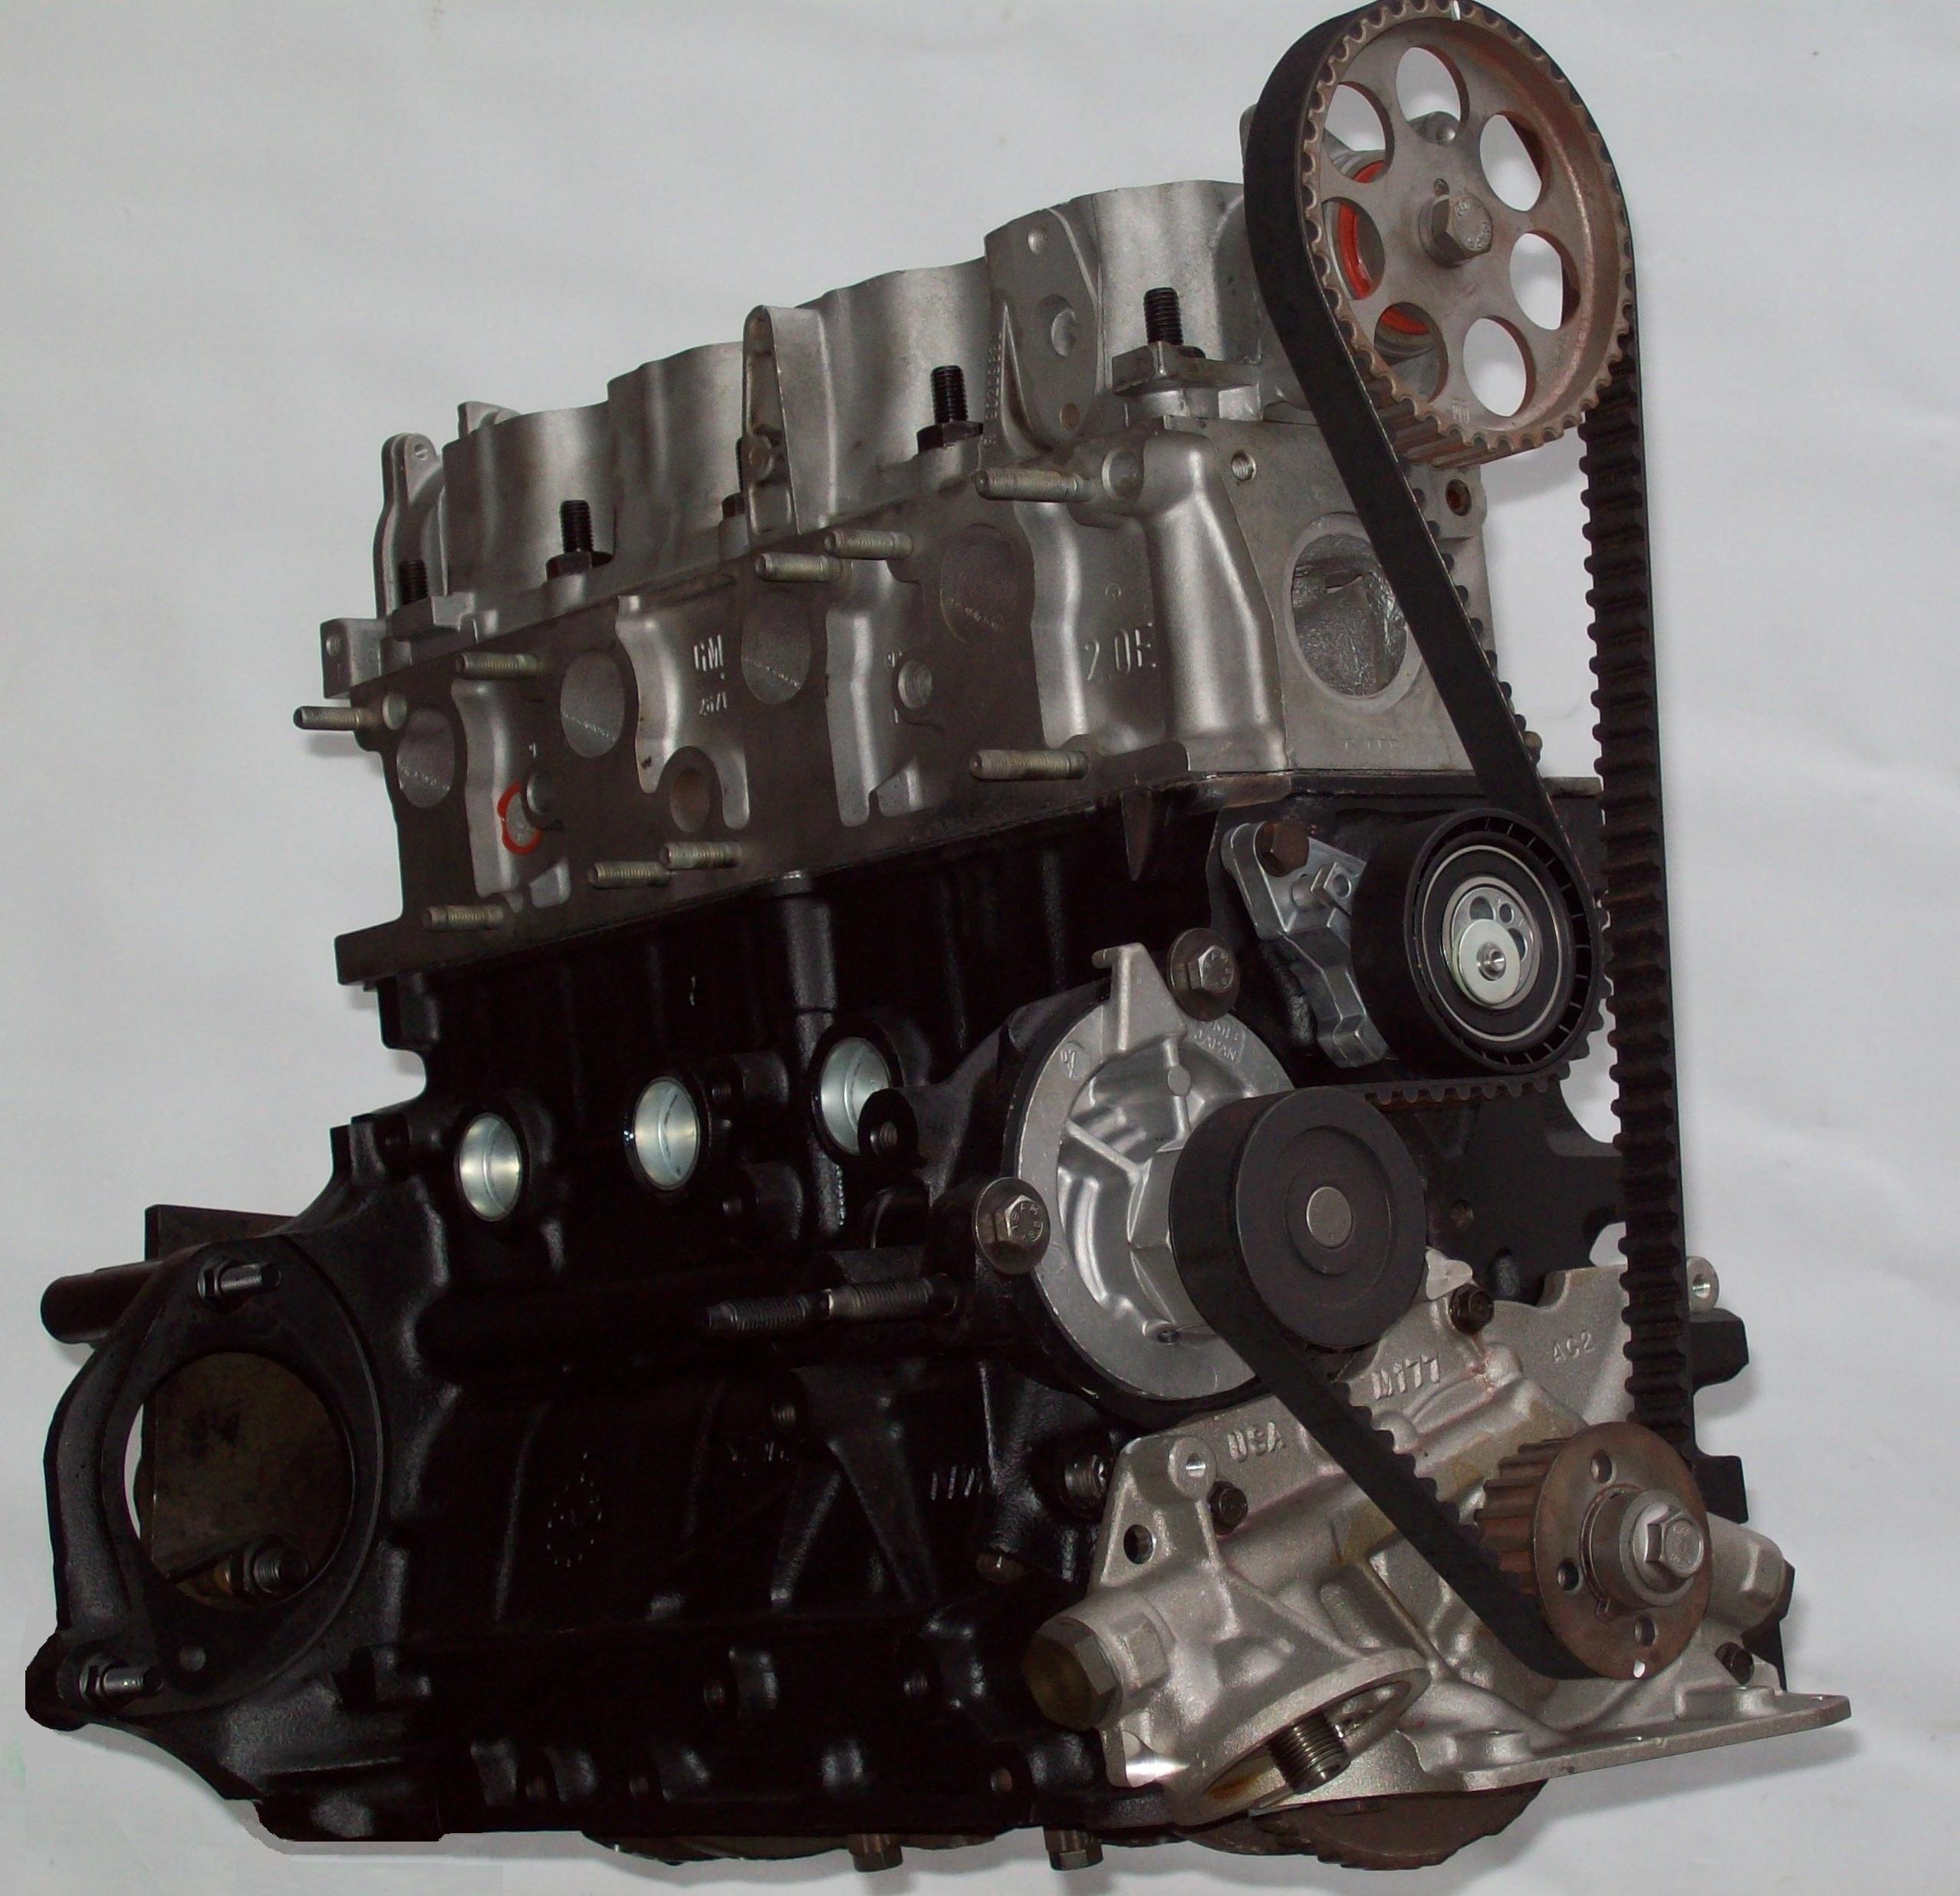 1993 Pontiac Bonneville Transmission: Pontiac Remanufactured Engines